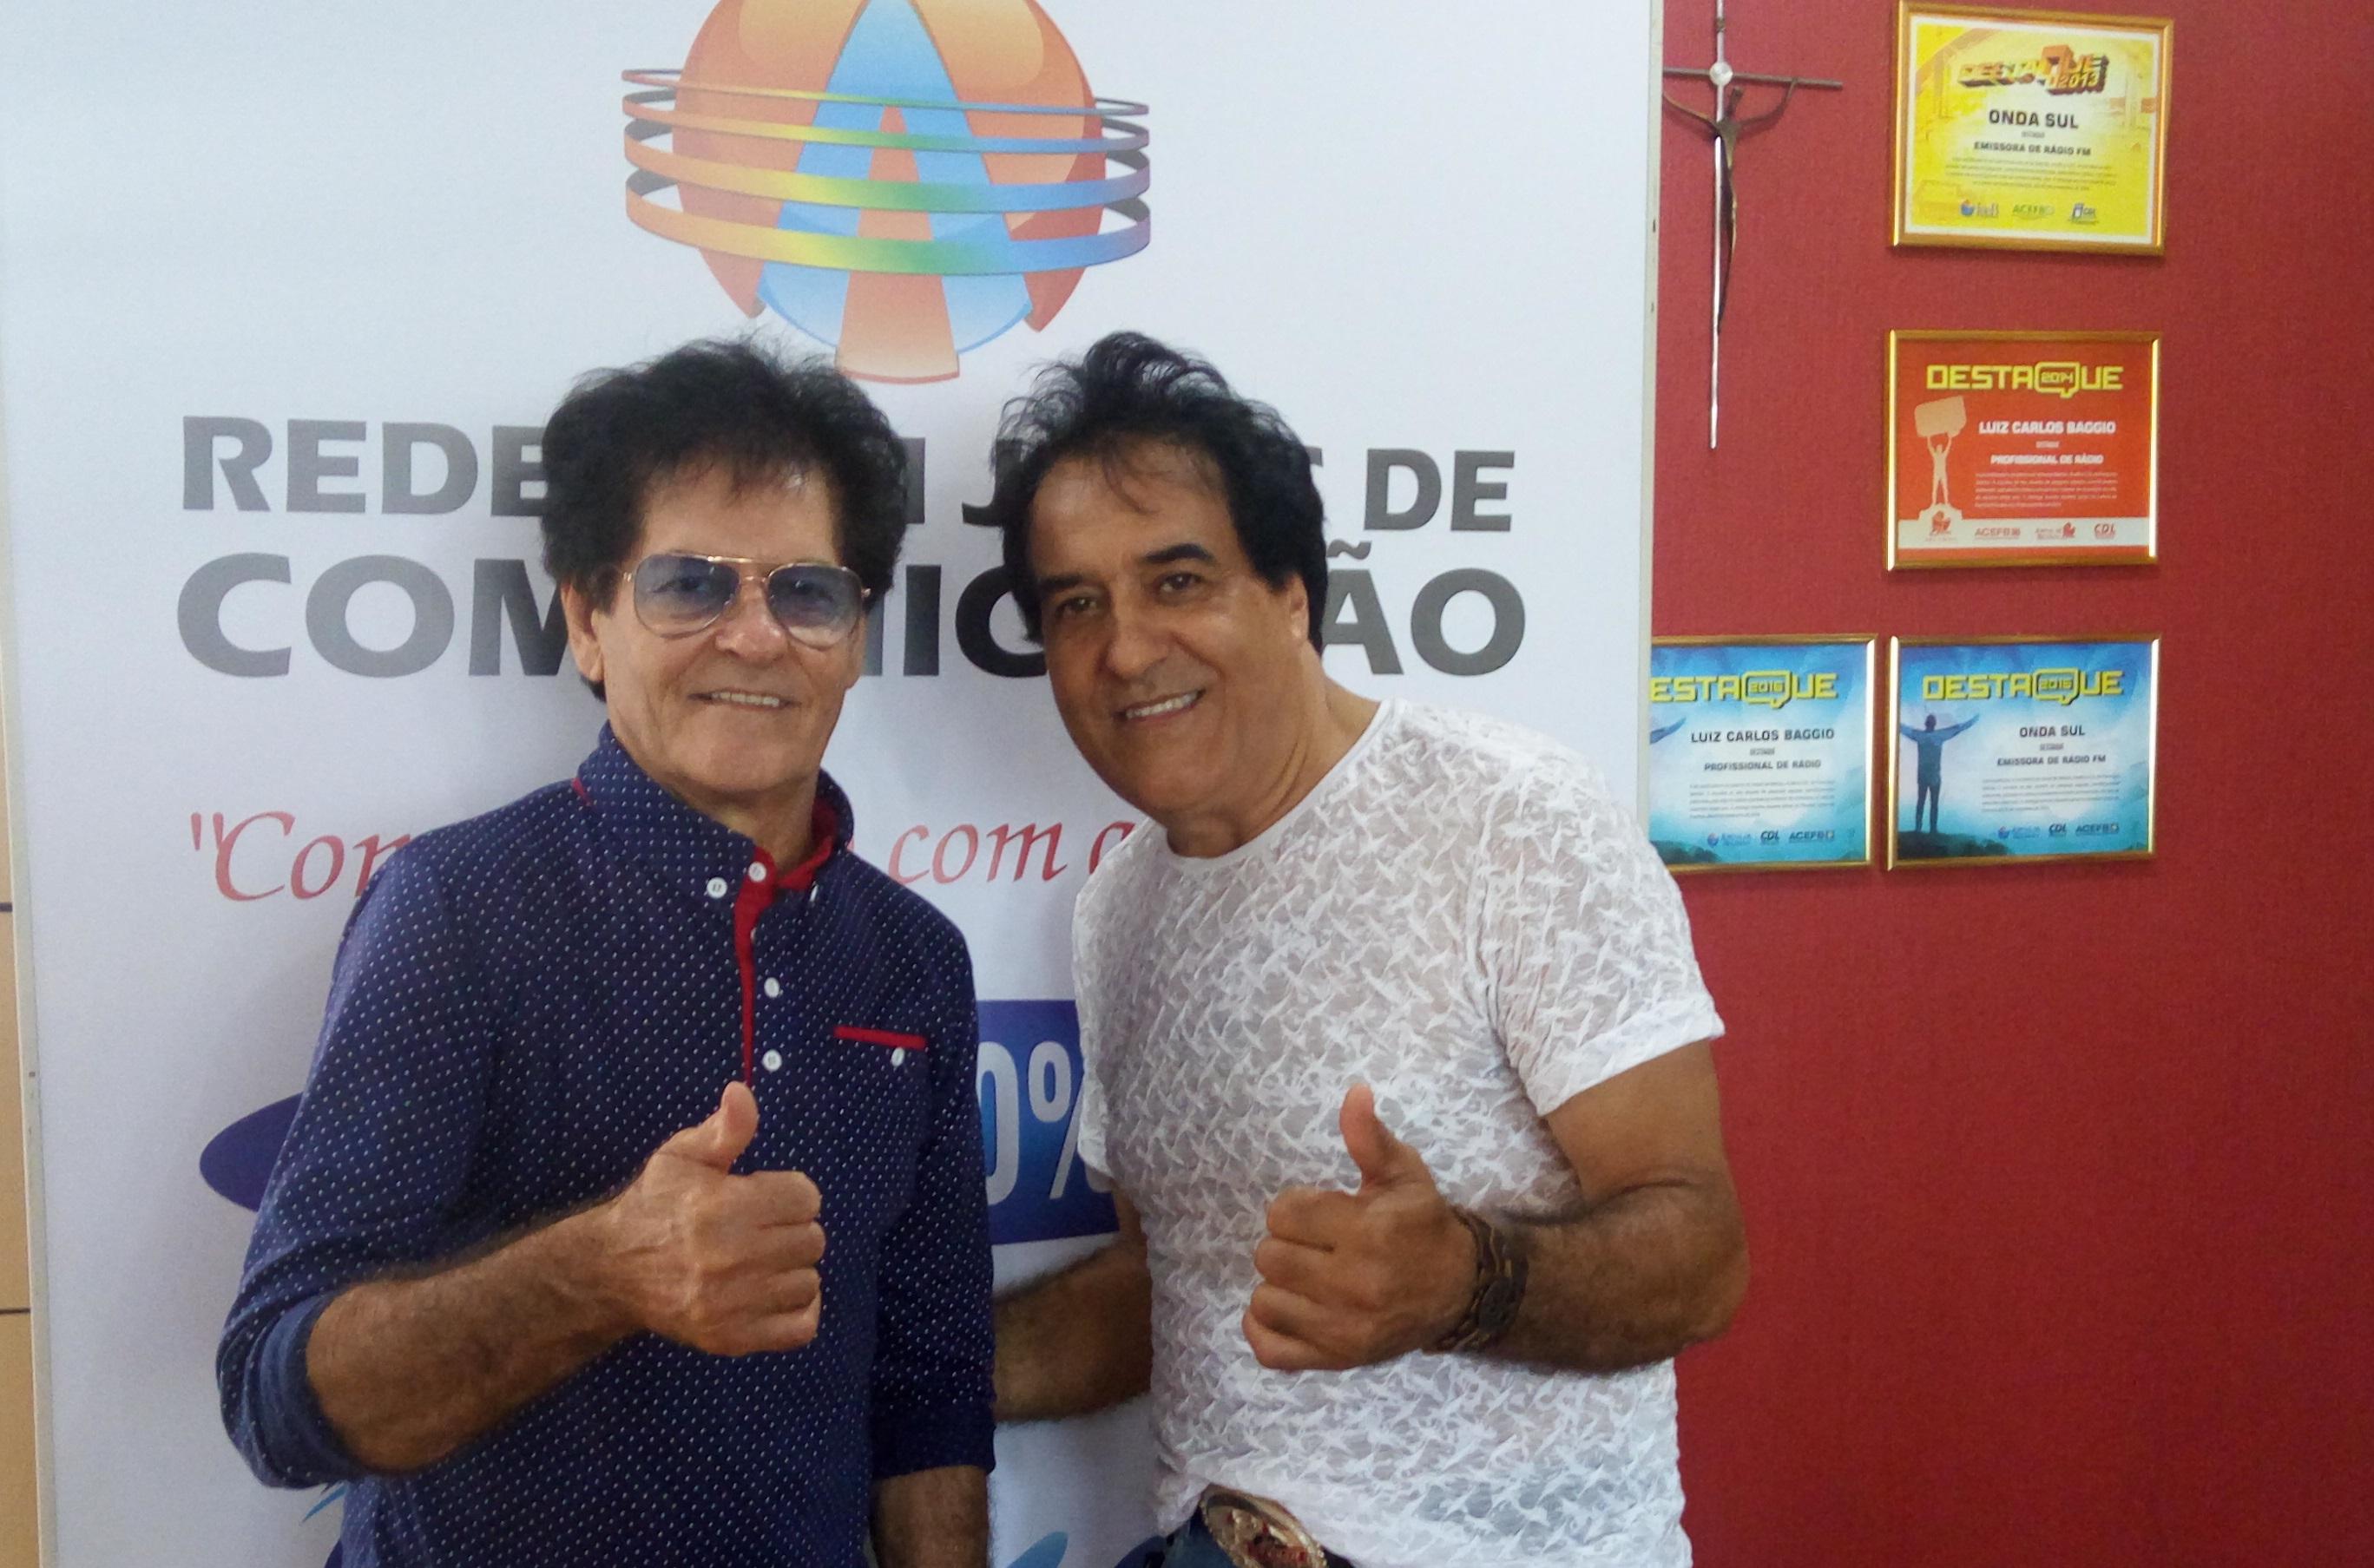 Bob & Robson visitam Rádio Onda Sul FM